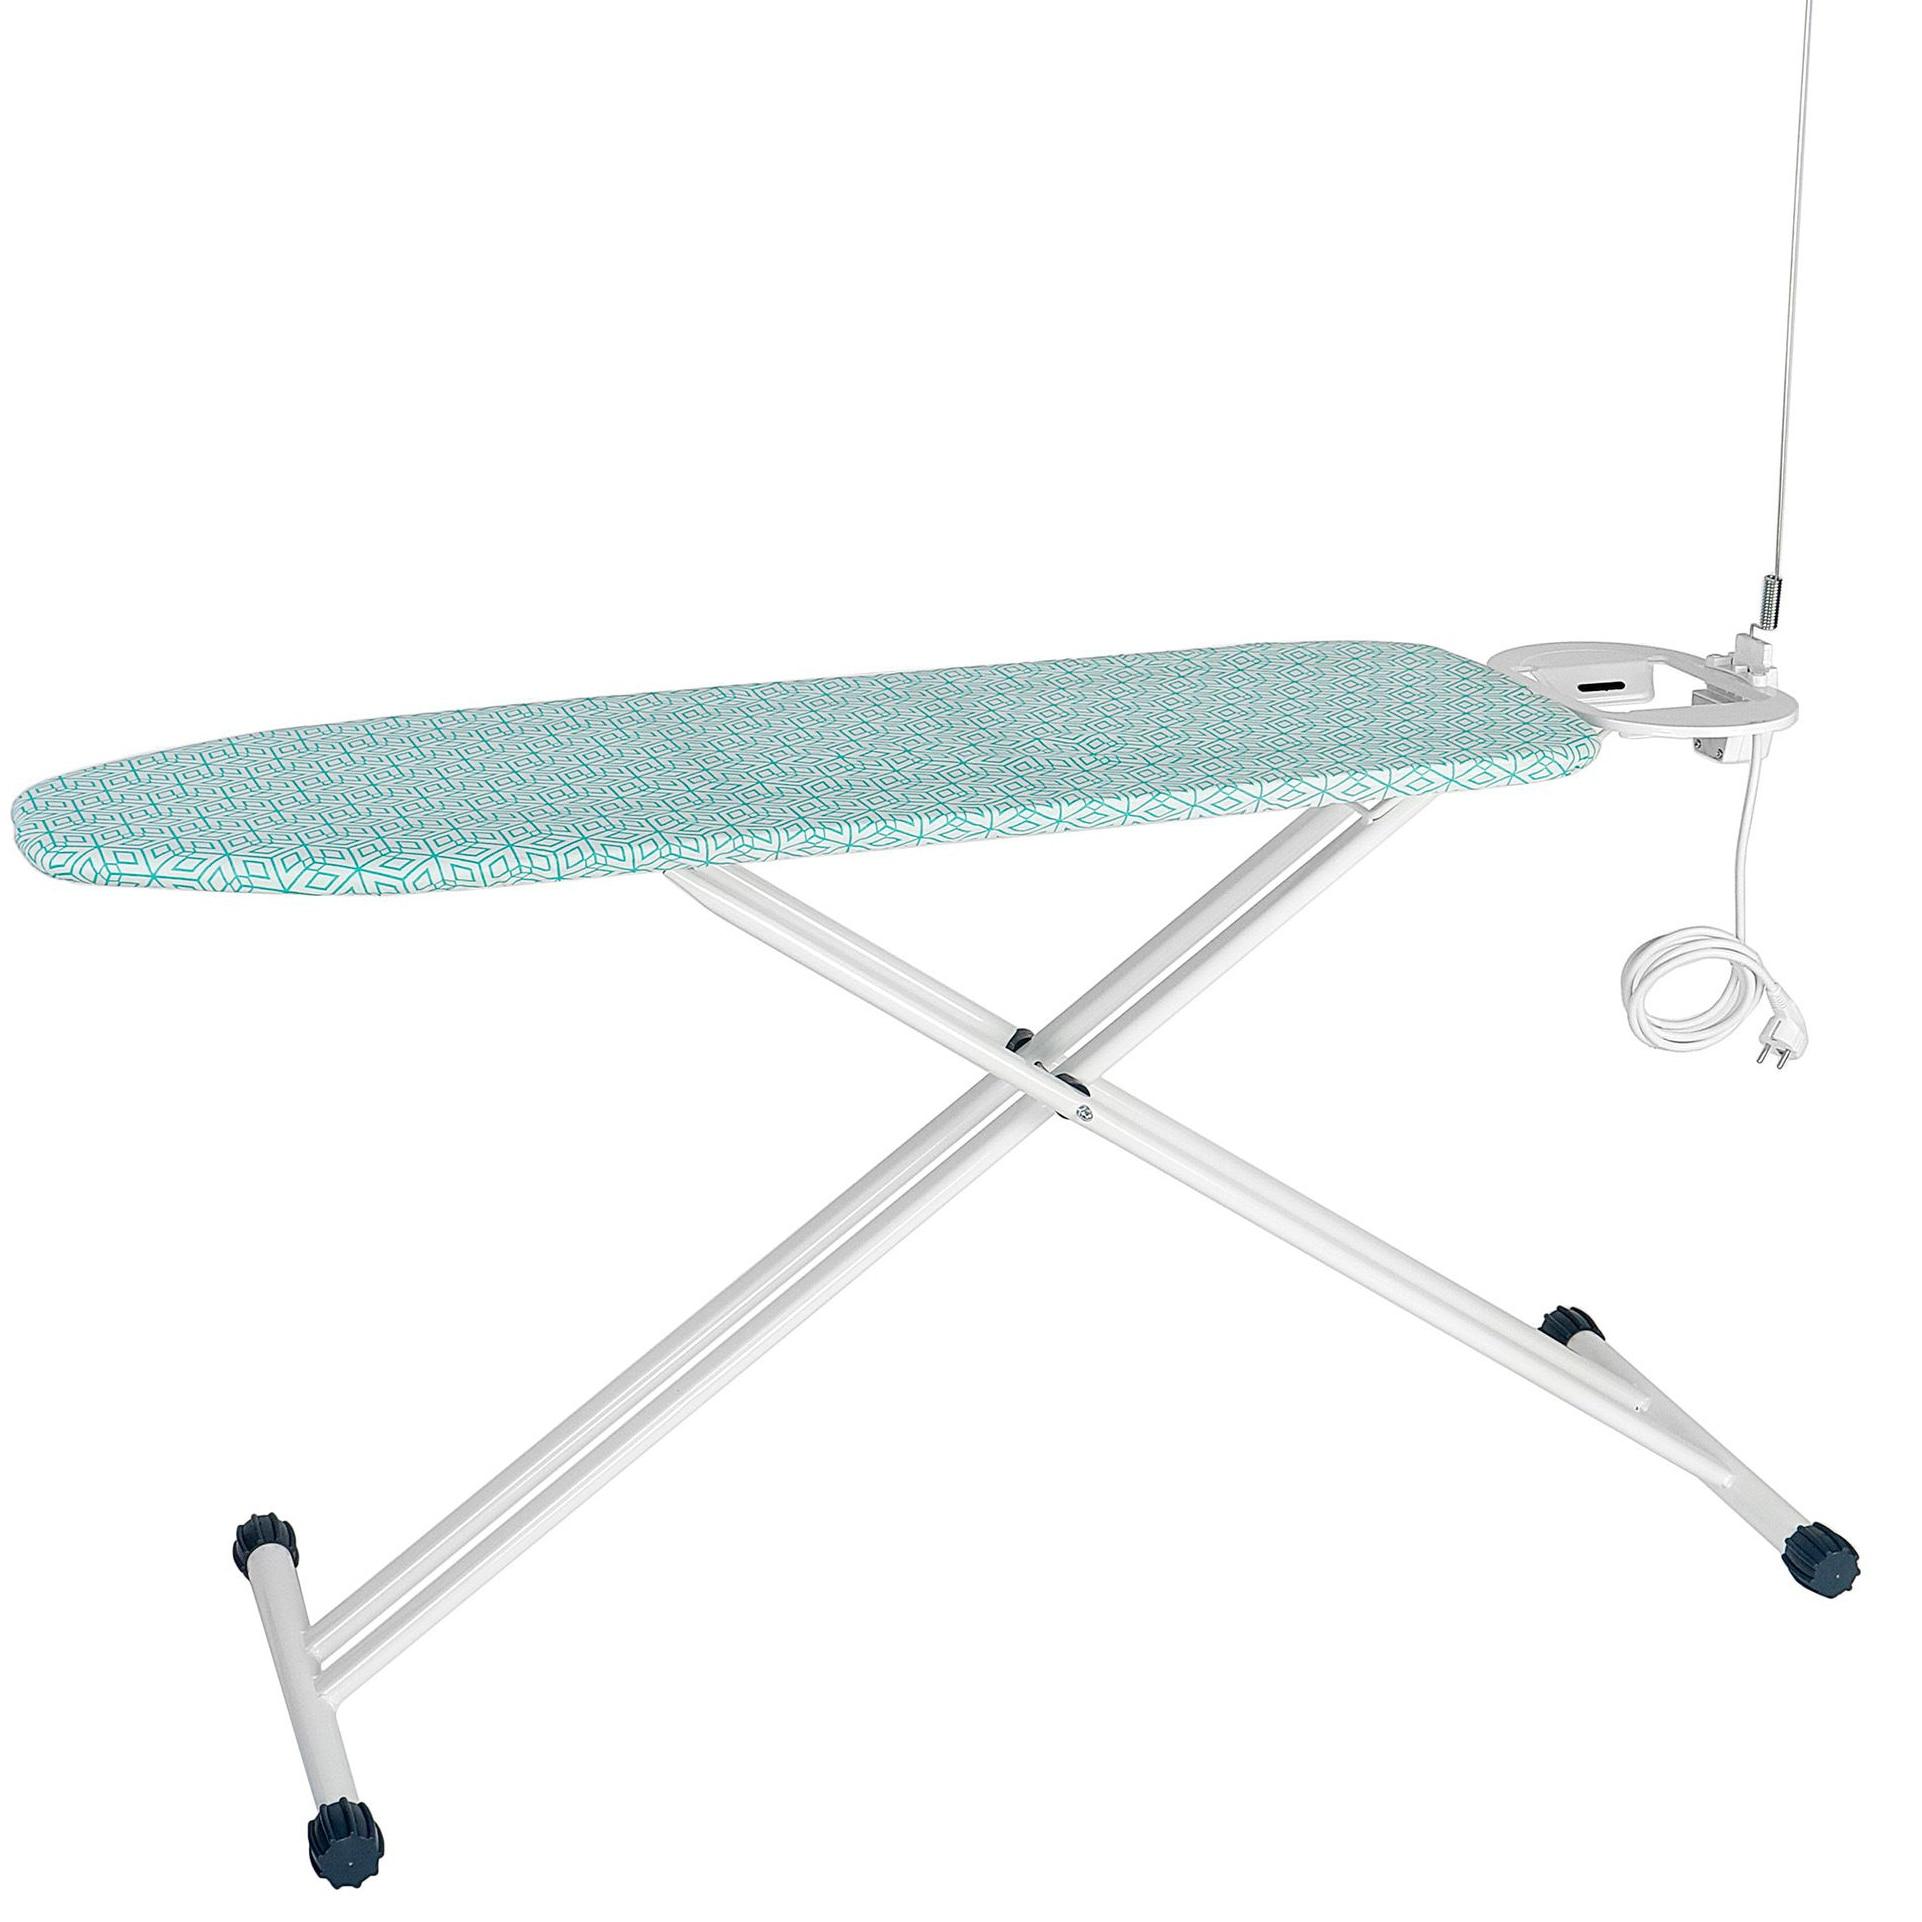 Fotografie Masa de calcat Kring Pro Confort, cu priza electrica si antena, 38 x 120 cm, Alb/Verde